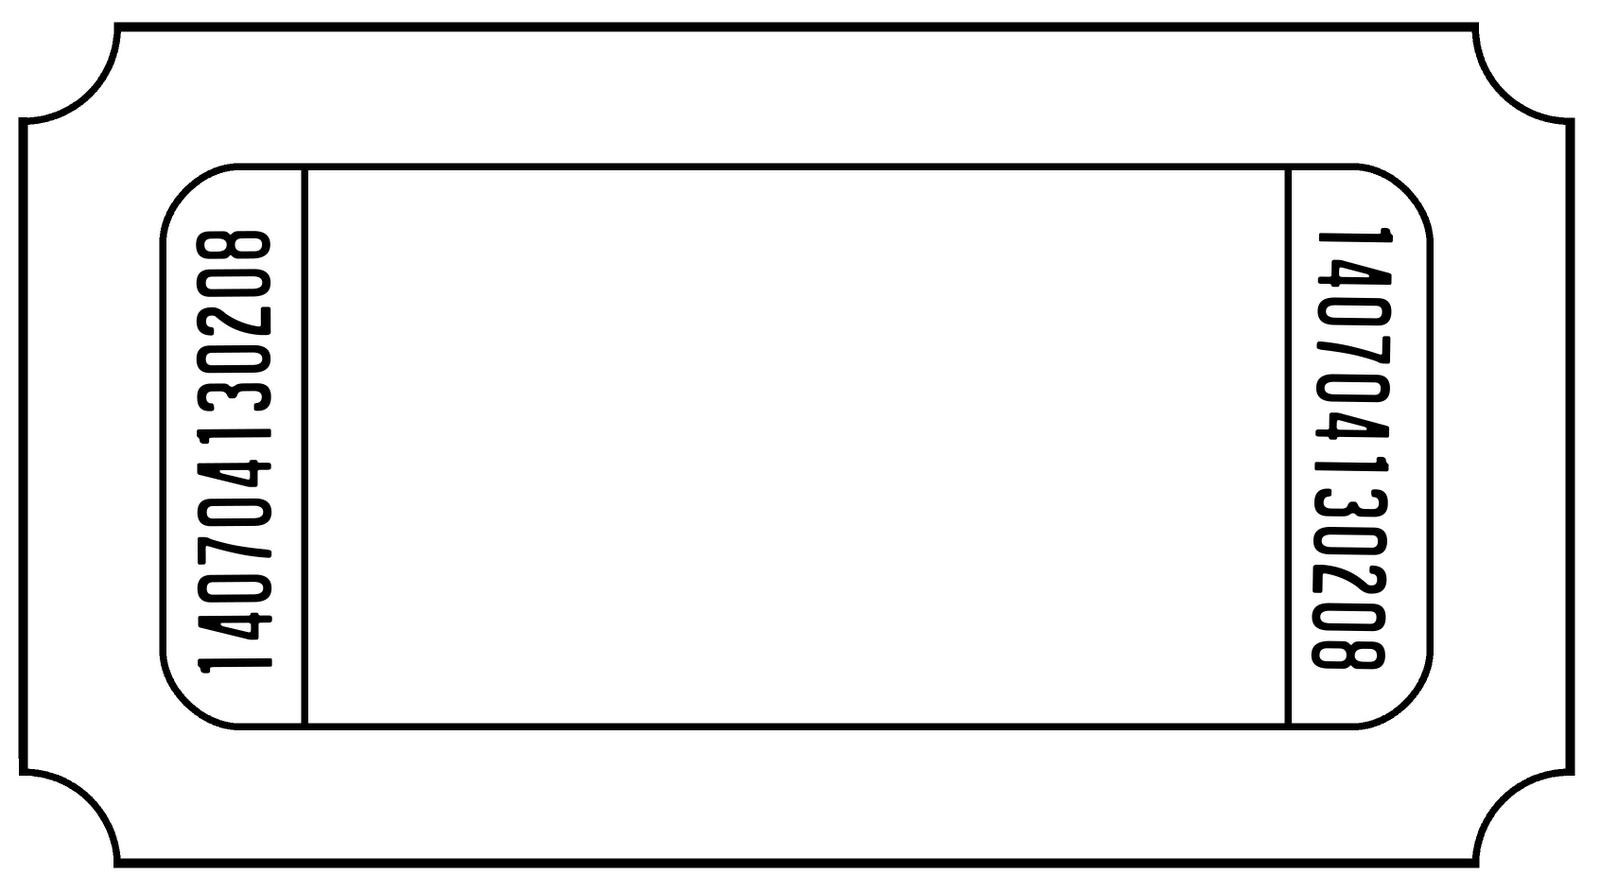 Blank Ticket Stub Clipart - Create Tickets Free Printable